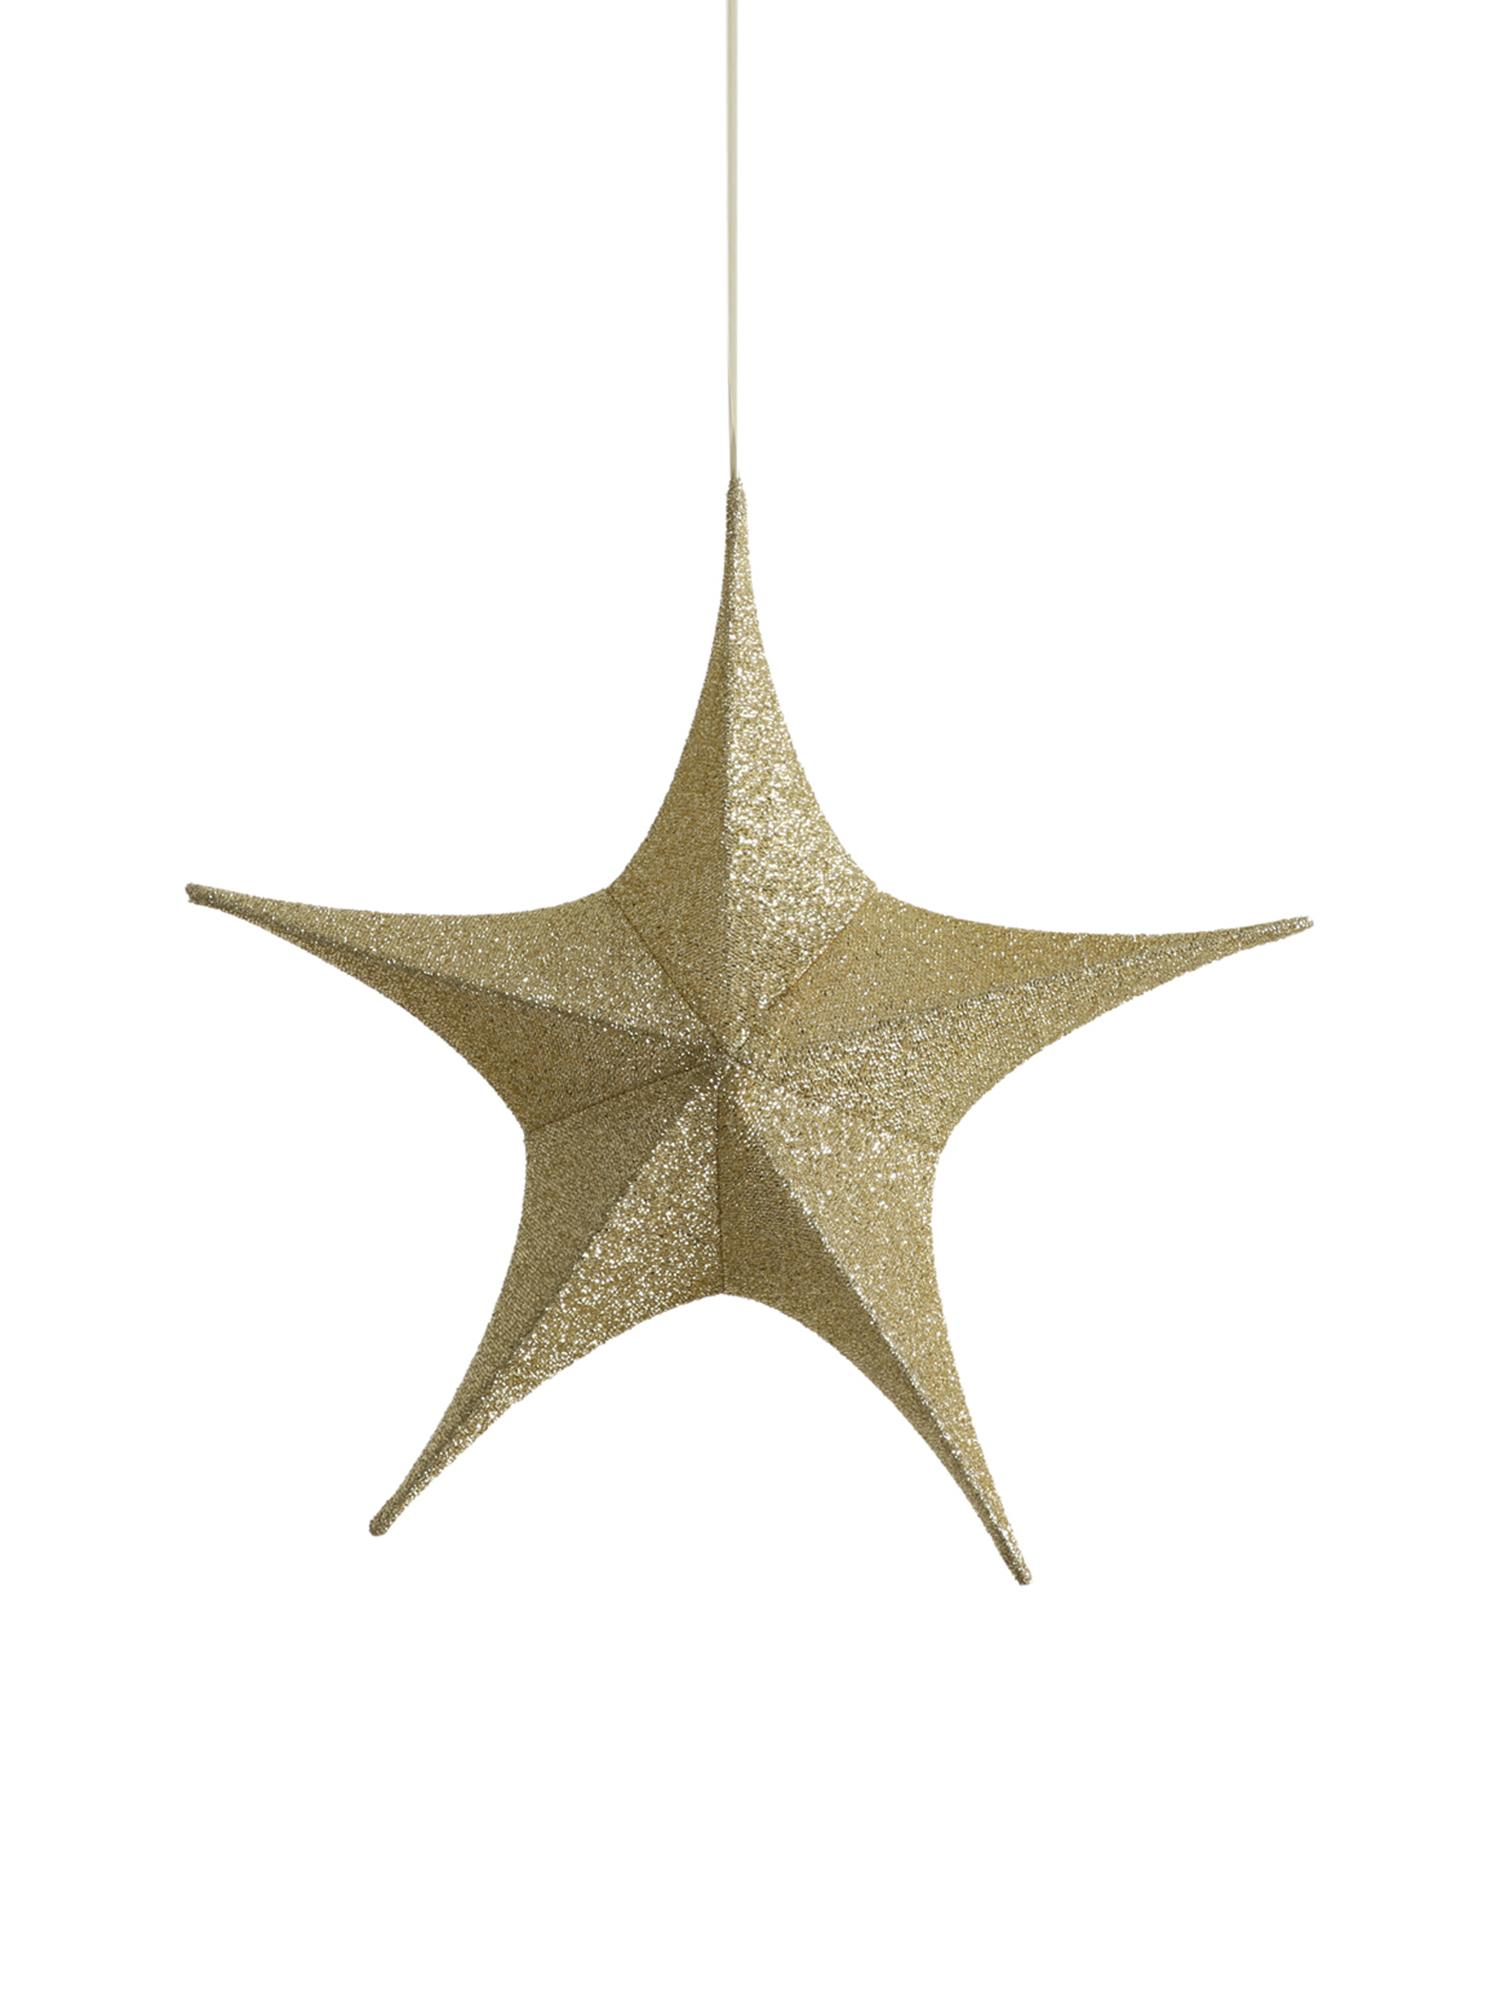 Deko-Objekt Kamilla, Bezug: Polyester, Gestell: Metall, Goldfarben, 65 x 60 cm